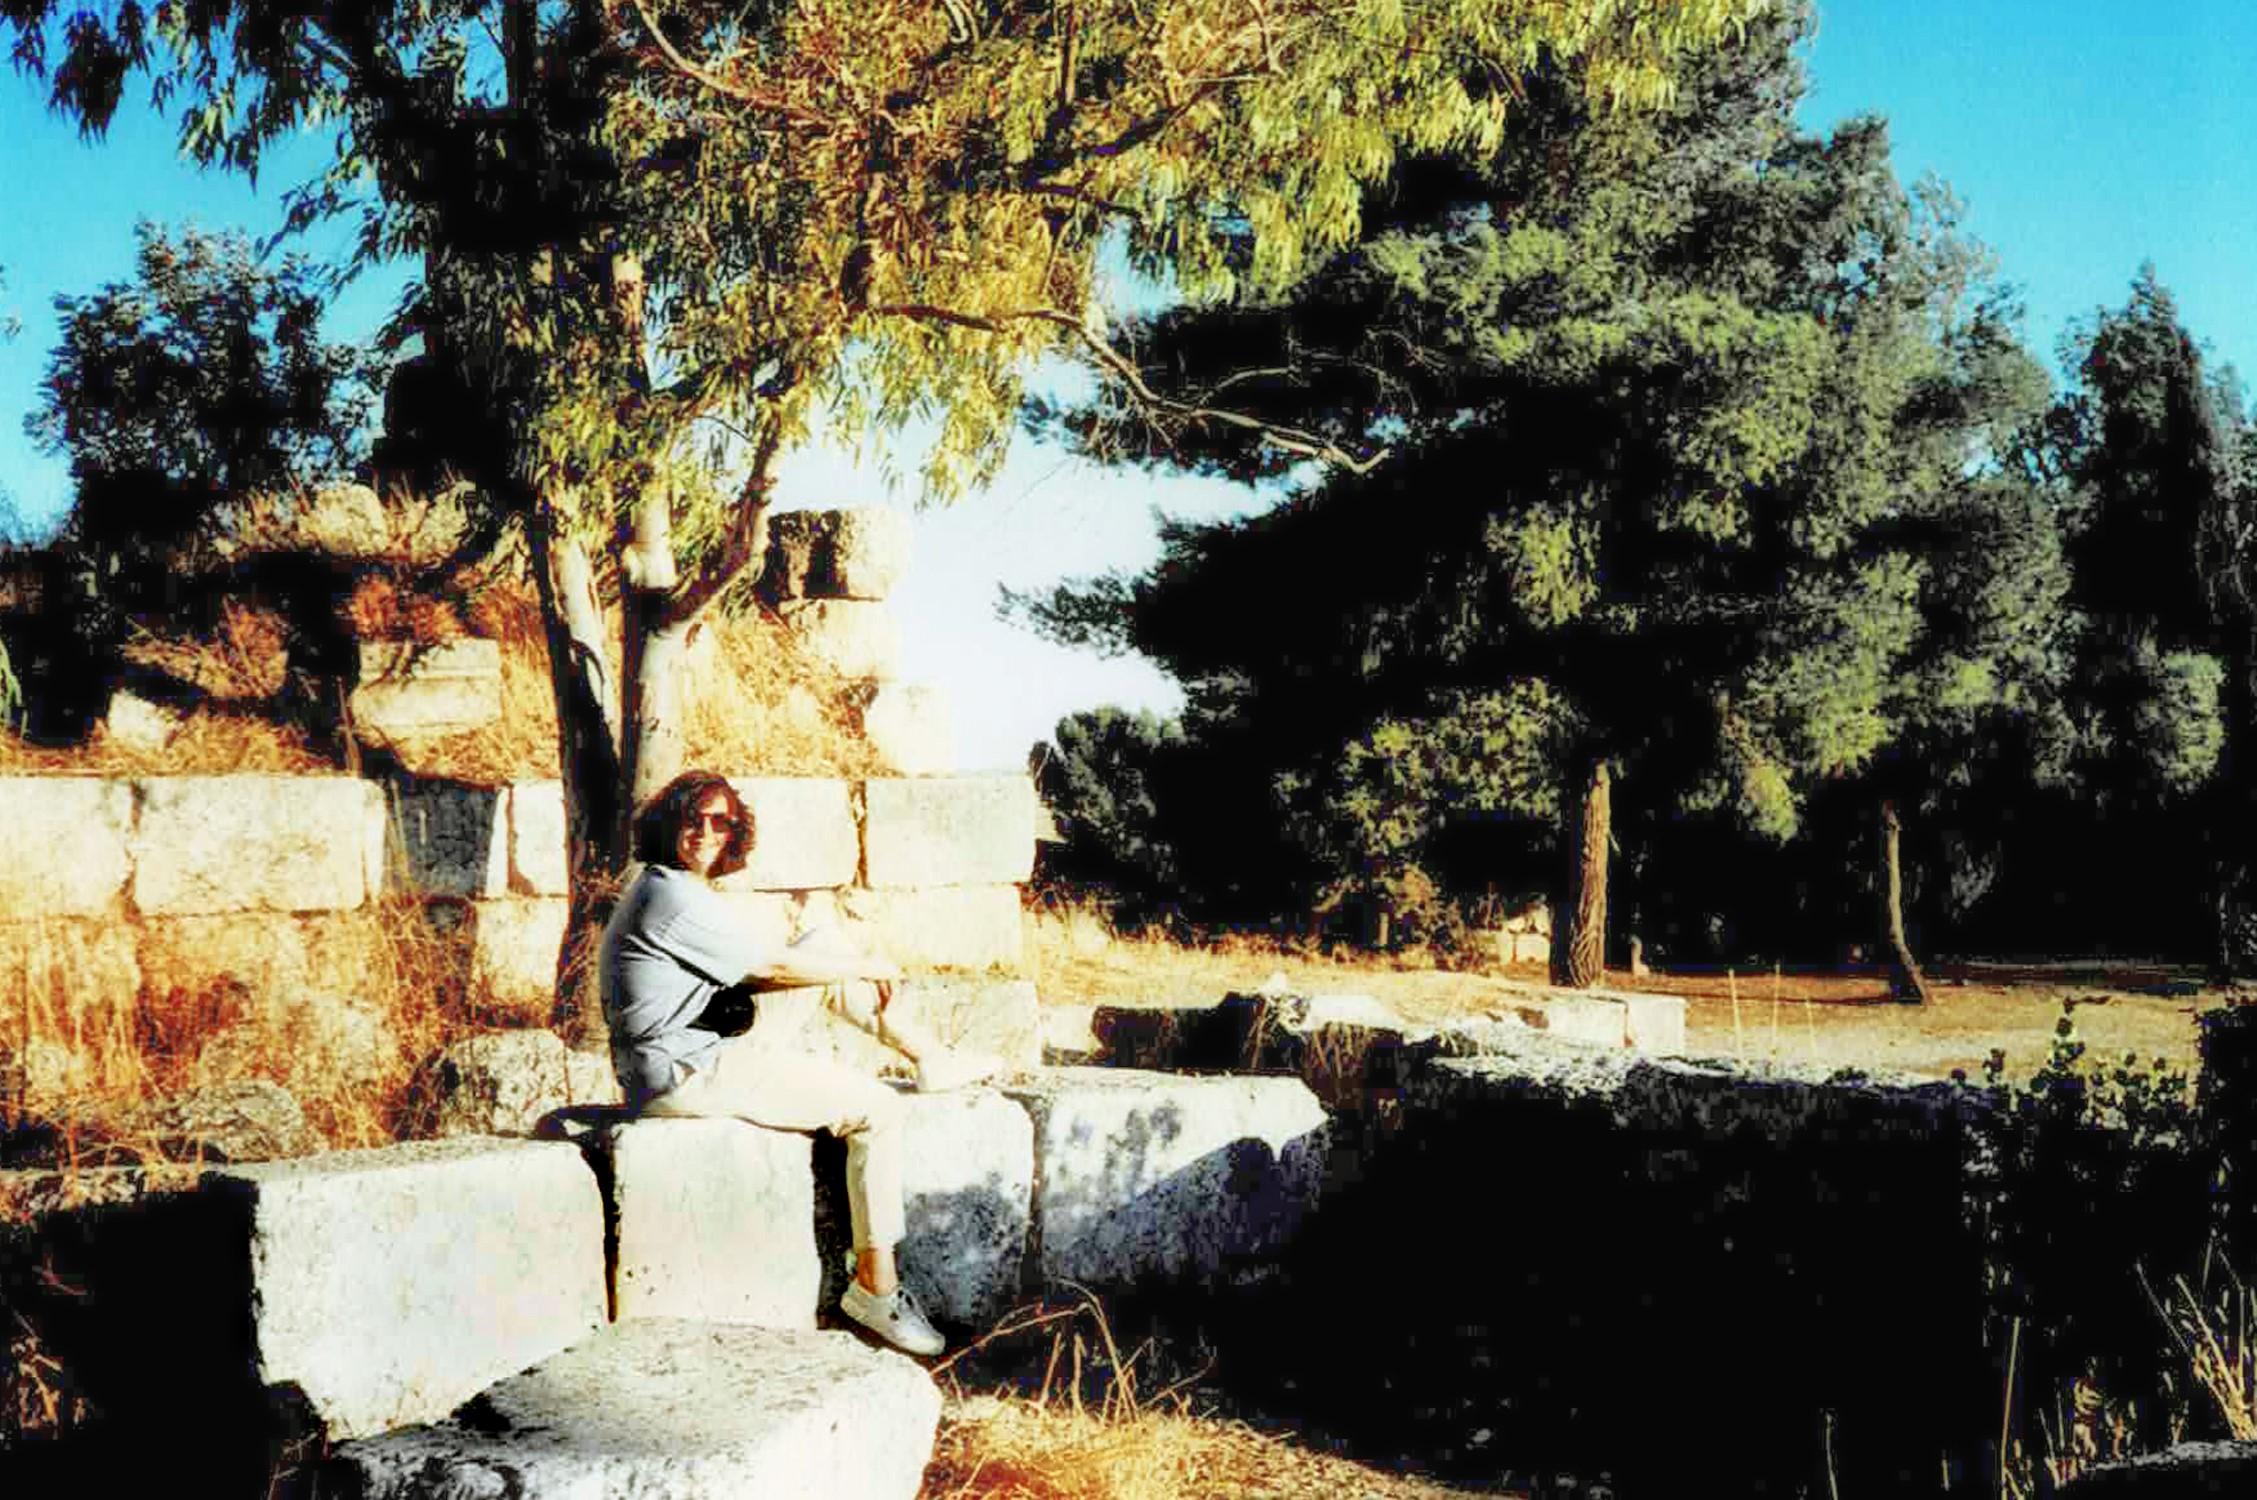 Woman sitting among ruins and pine trees